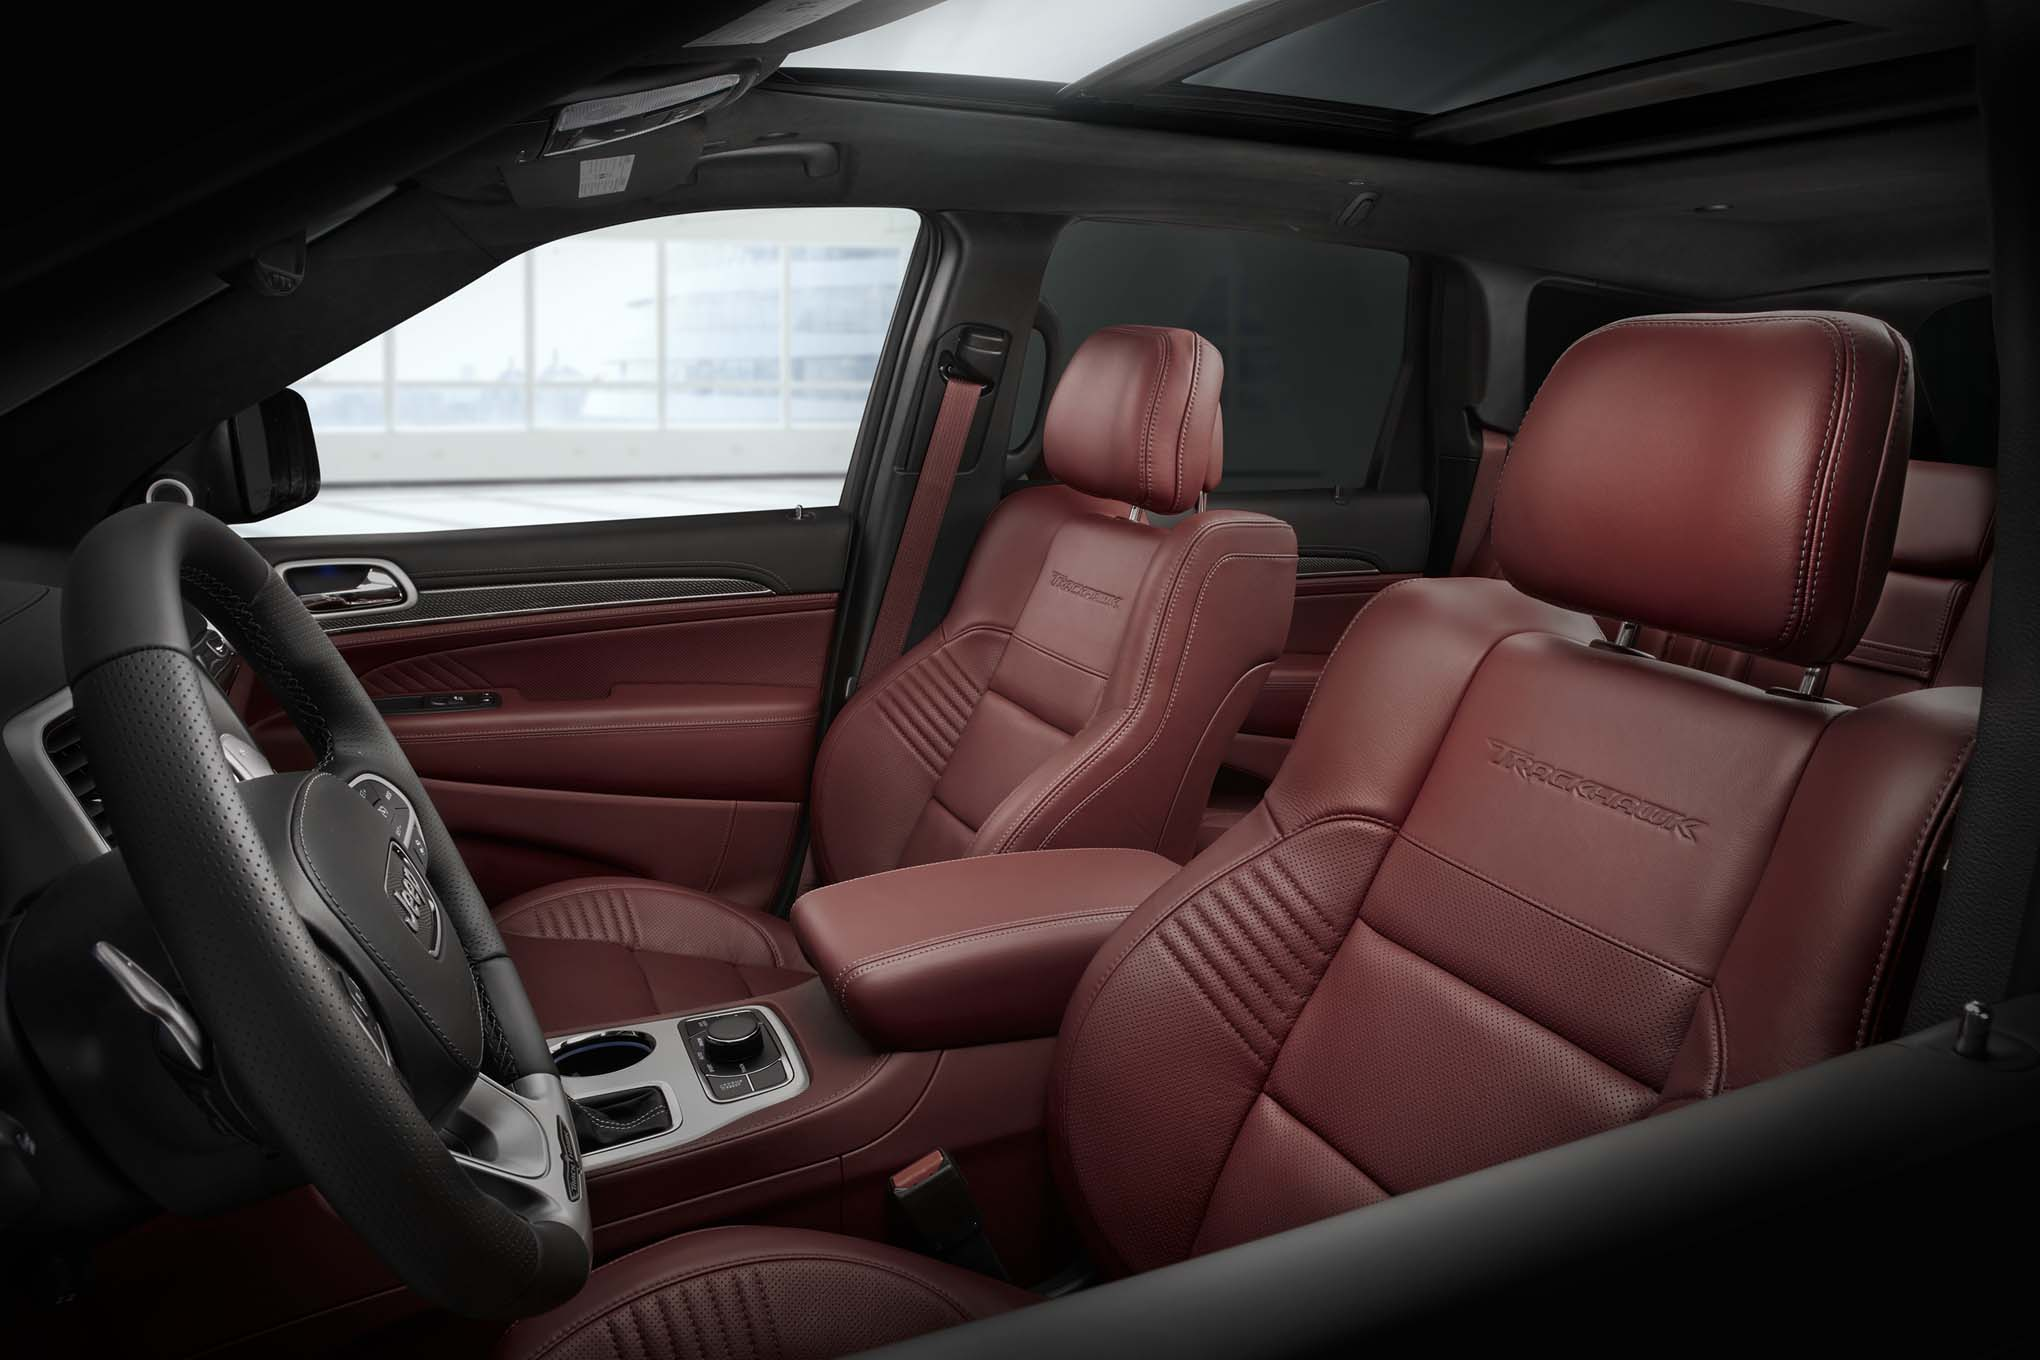 2018 jeep compass interior.  2018 a  inside 2018 jeep compass interior